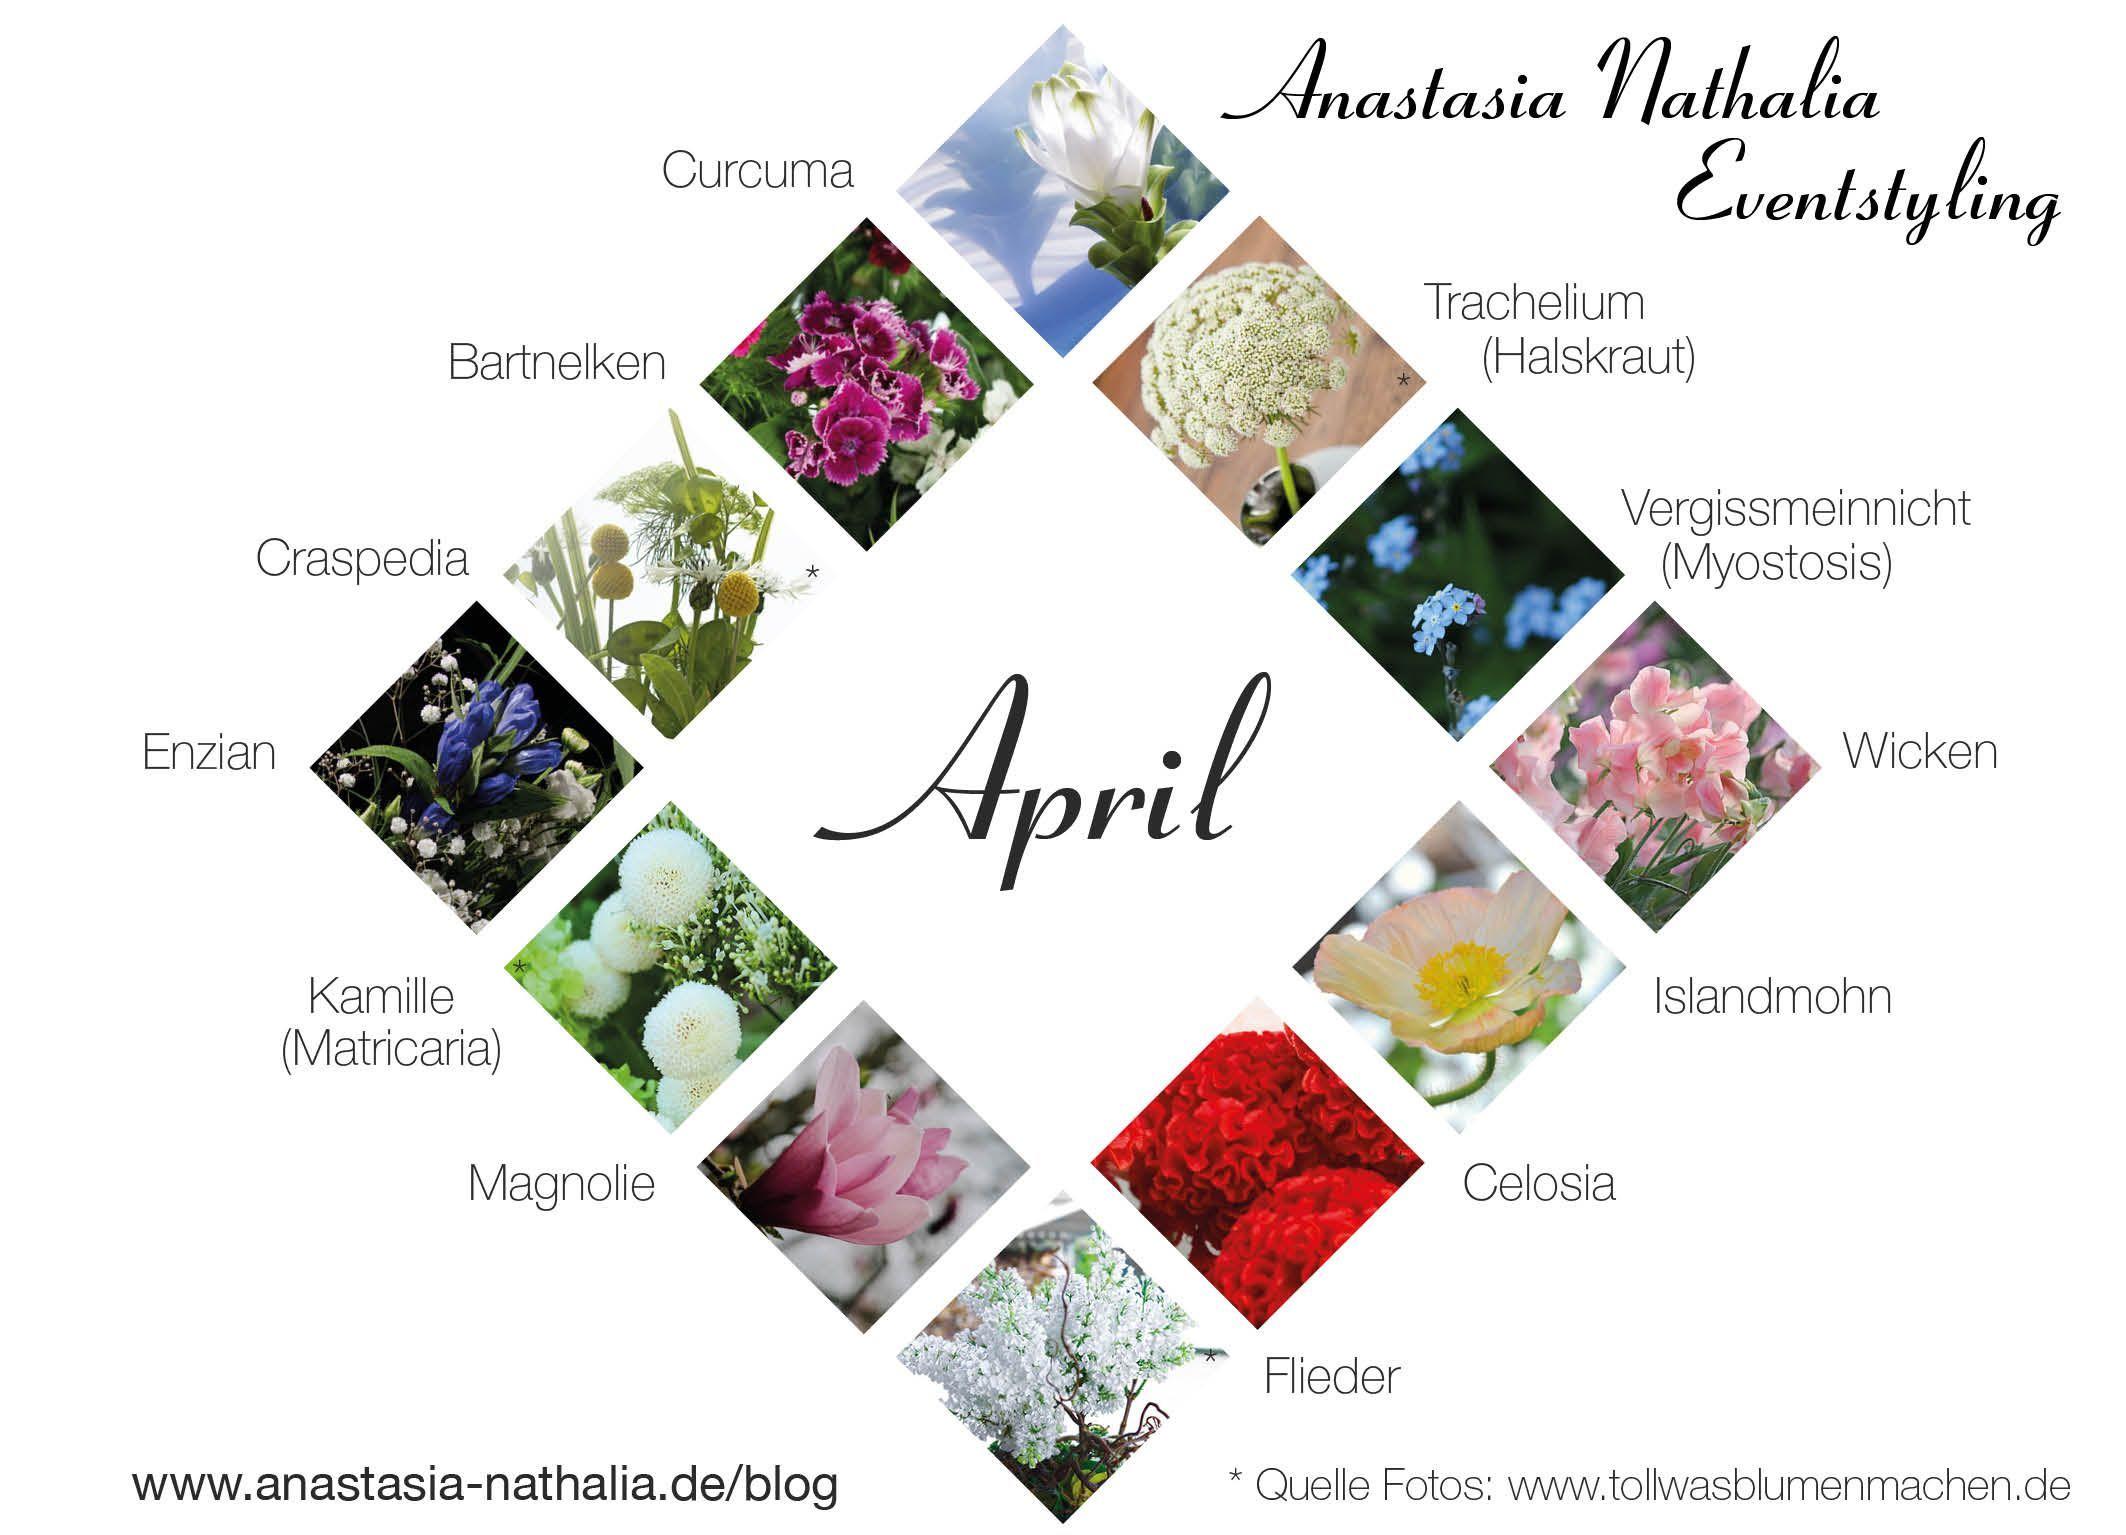 Blumen April Fruhling Floristik Hochzeit Hochzeitsblumen Monat Enzian Islandmoh Fruhlings Hochzeit Hashtag Oktober Blumen Hochzeitsblumen Oktober Hochzeit